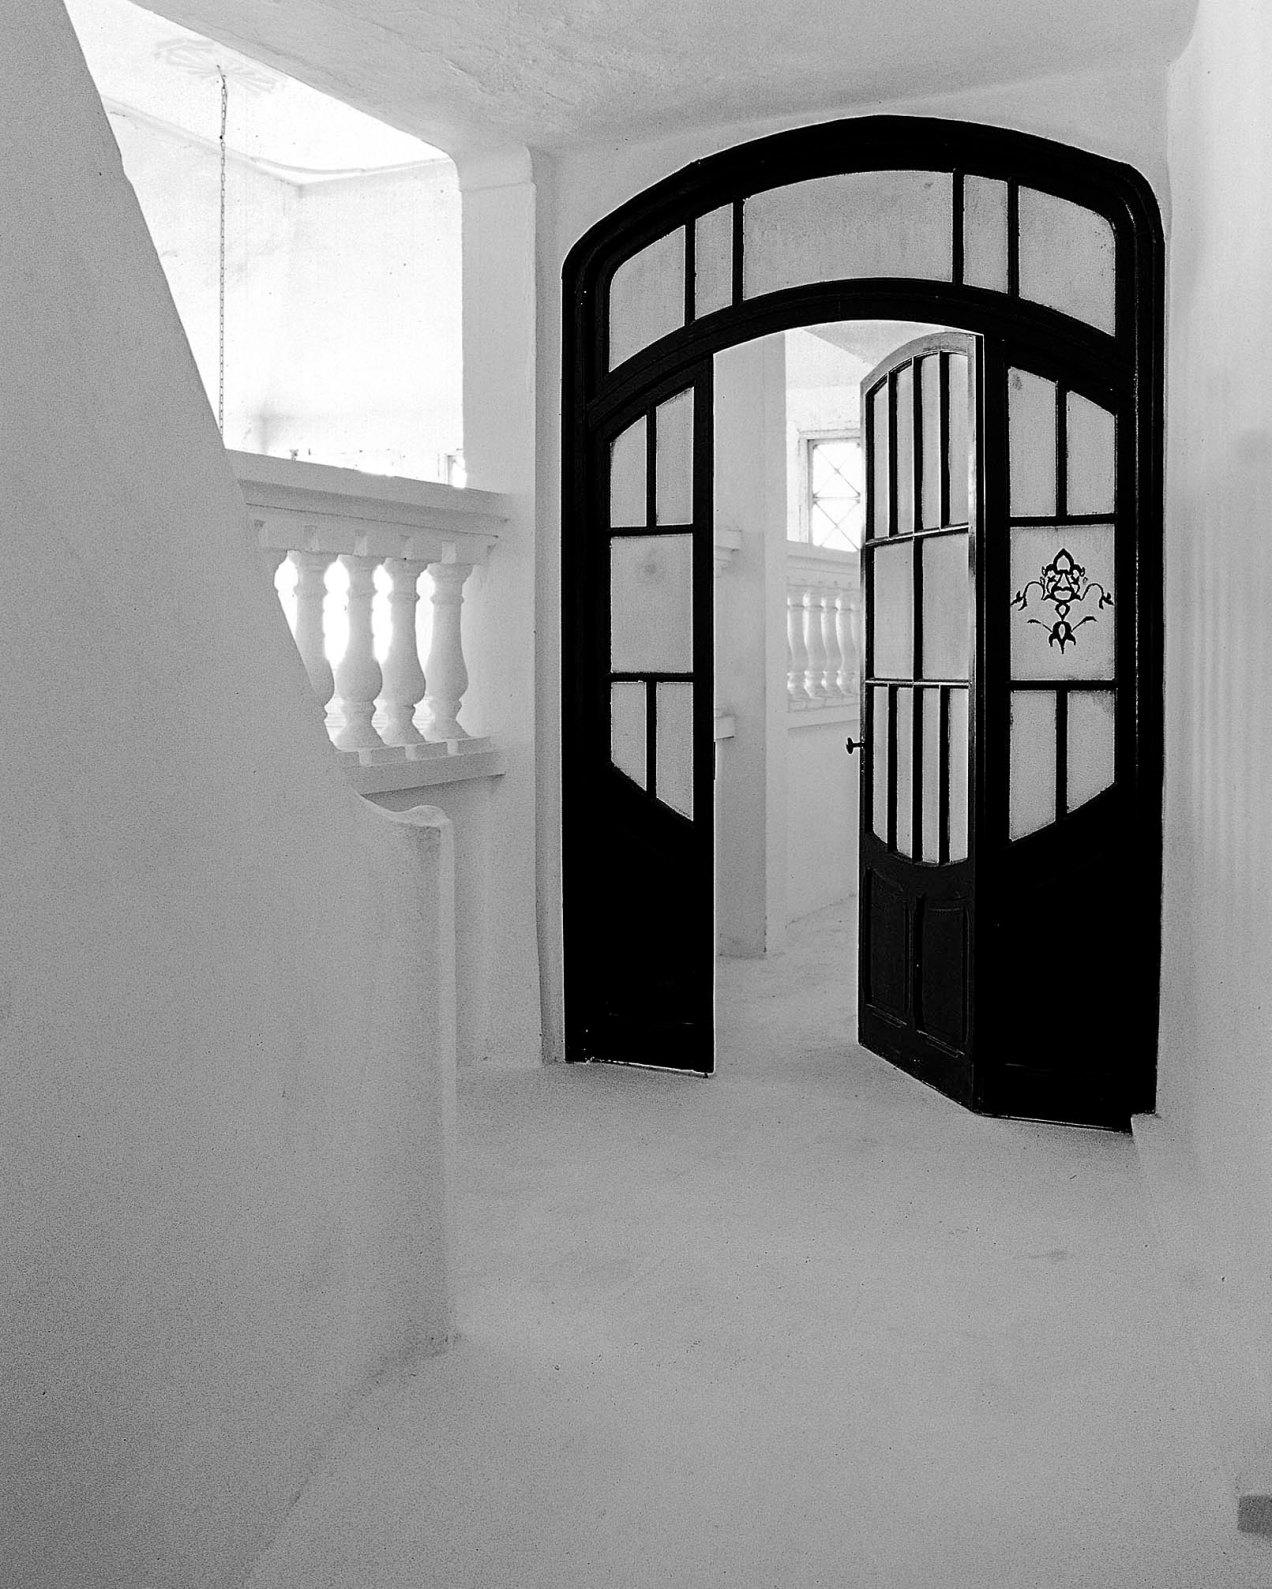 Laure Welfling, Tanger, gildalliere, 2005